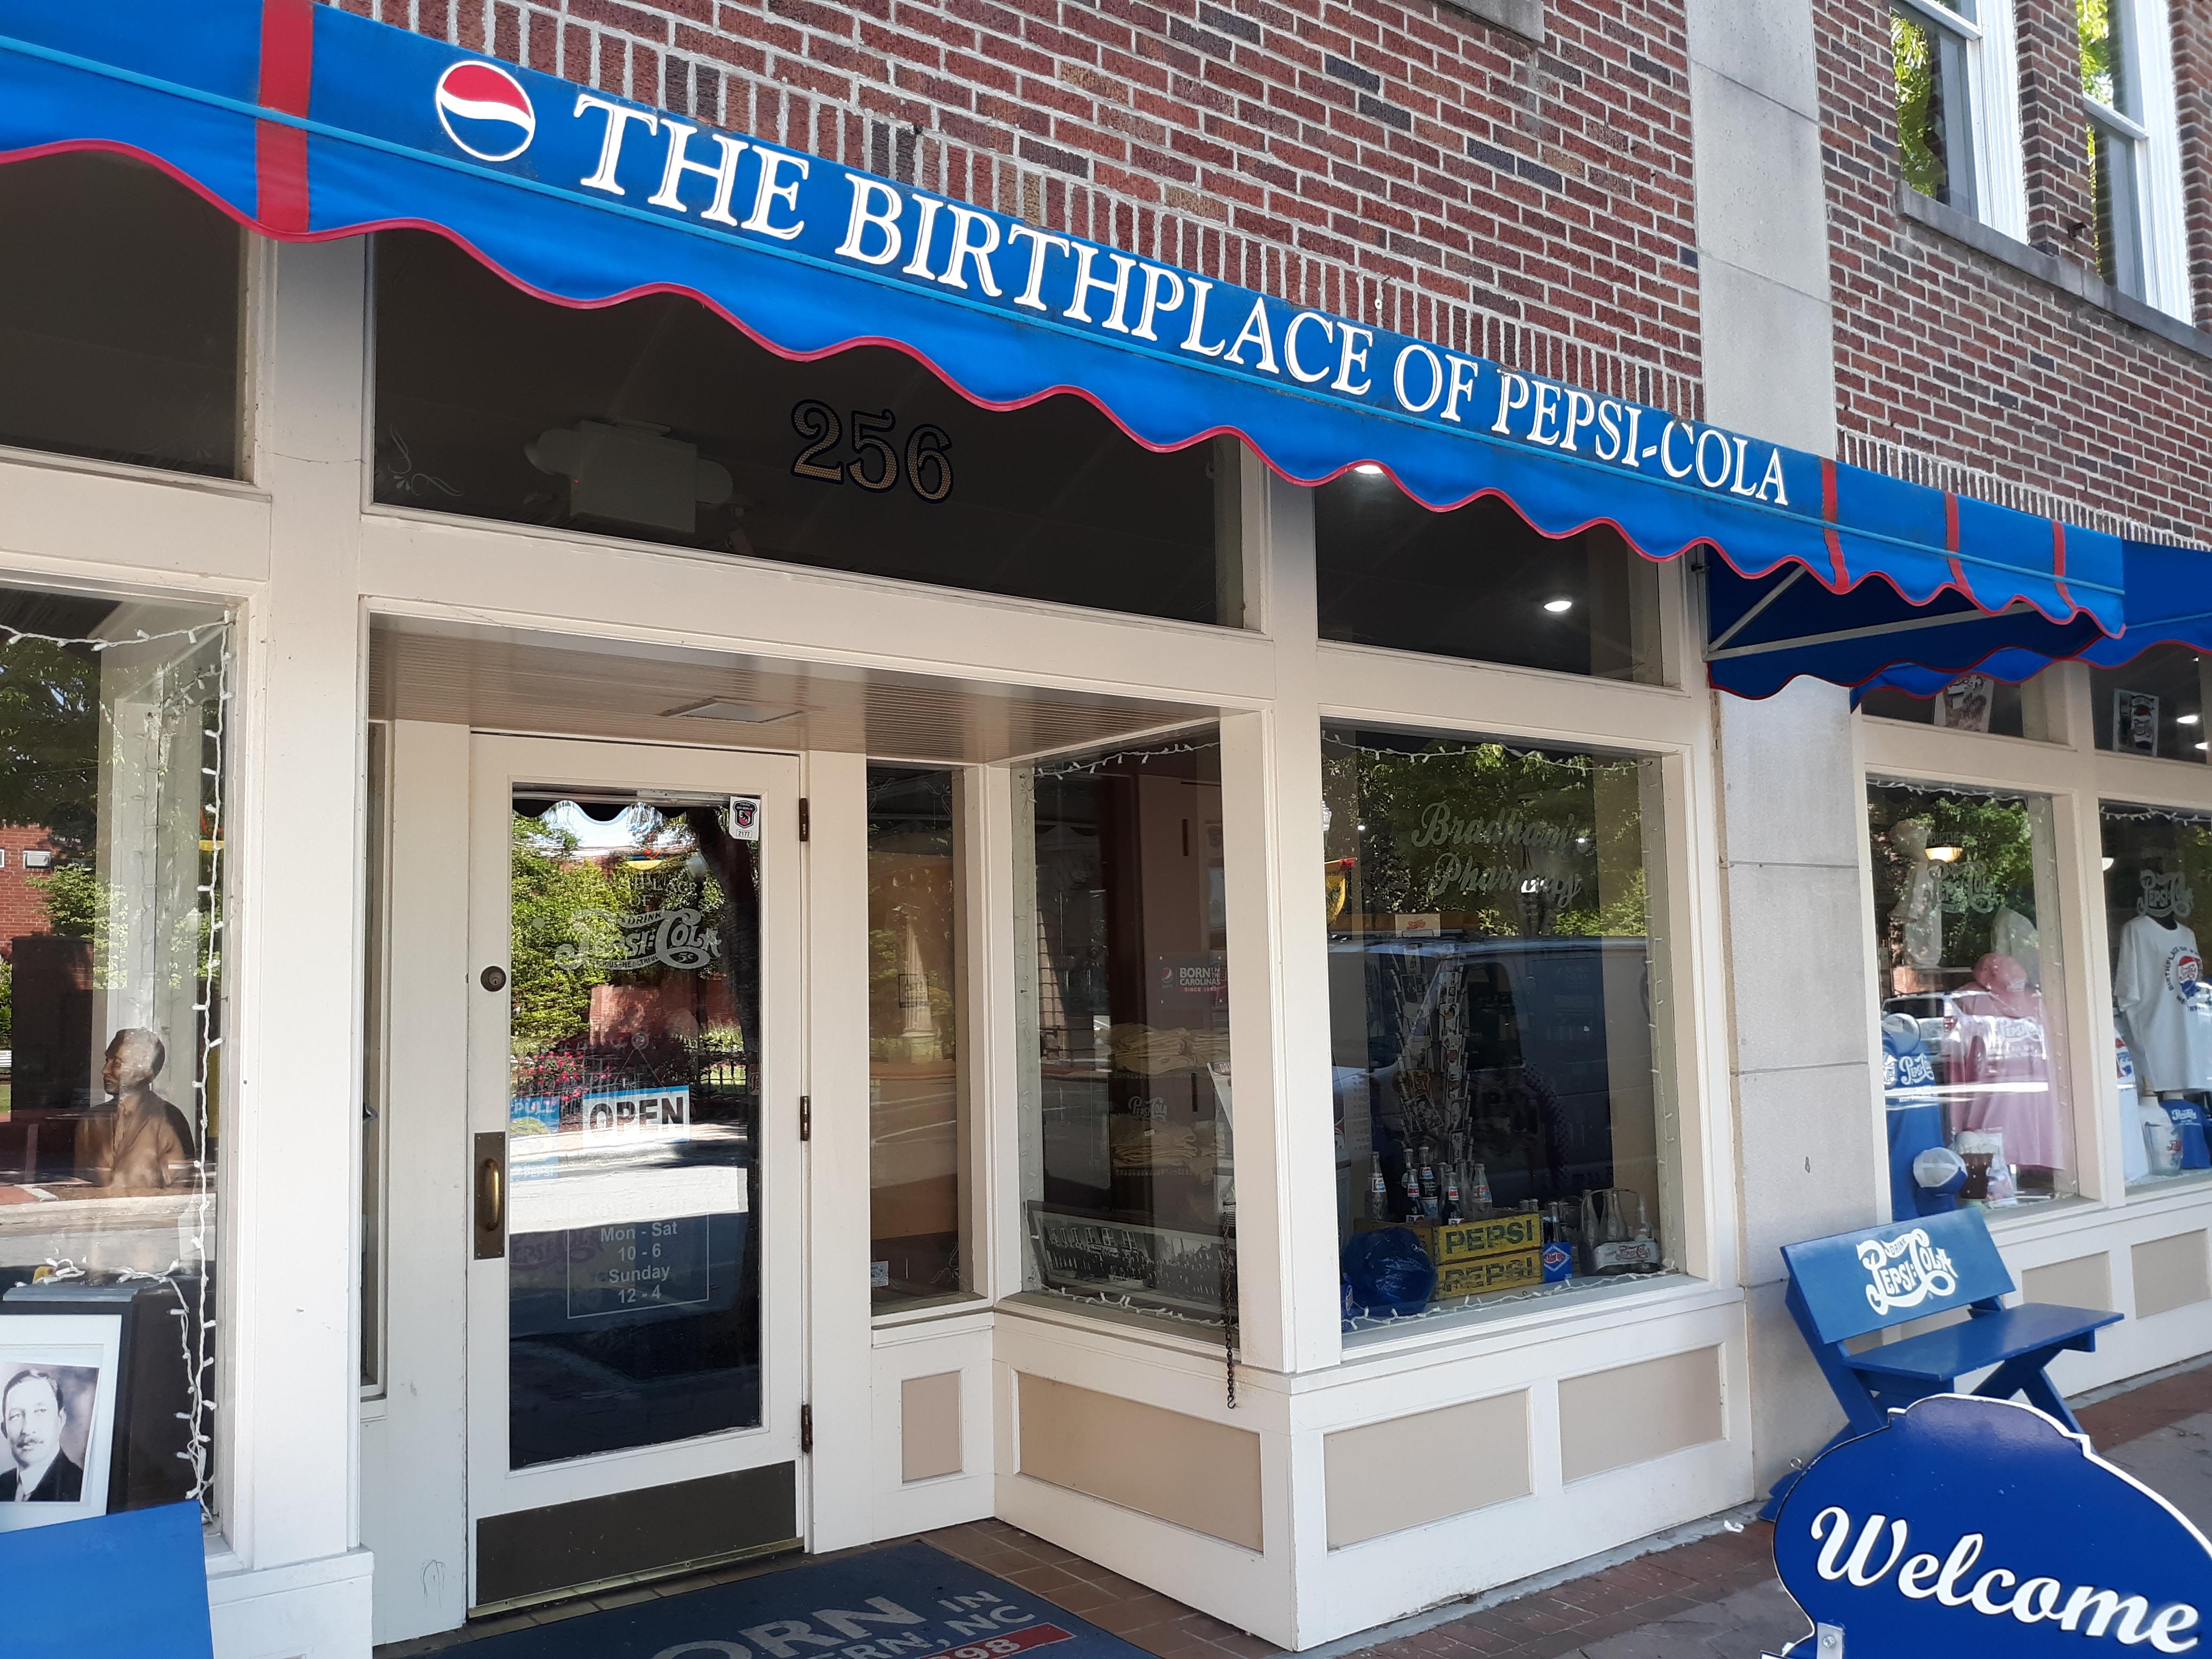 Birthplace Of Pepsi Cola, New Bern